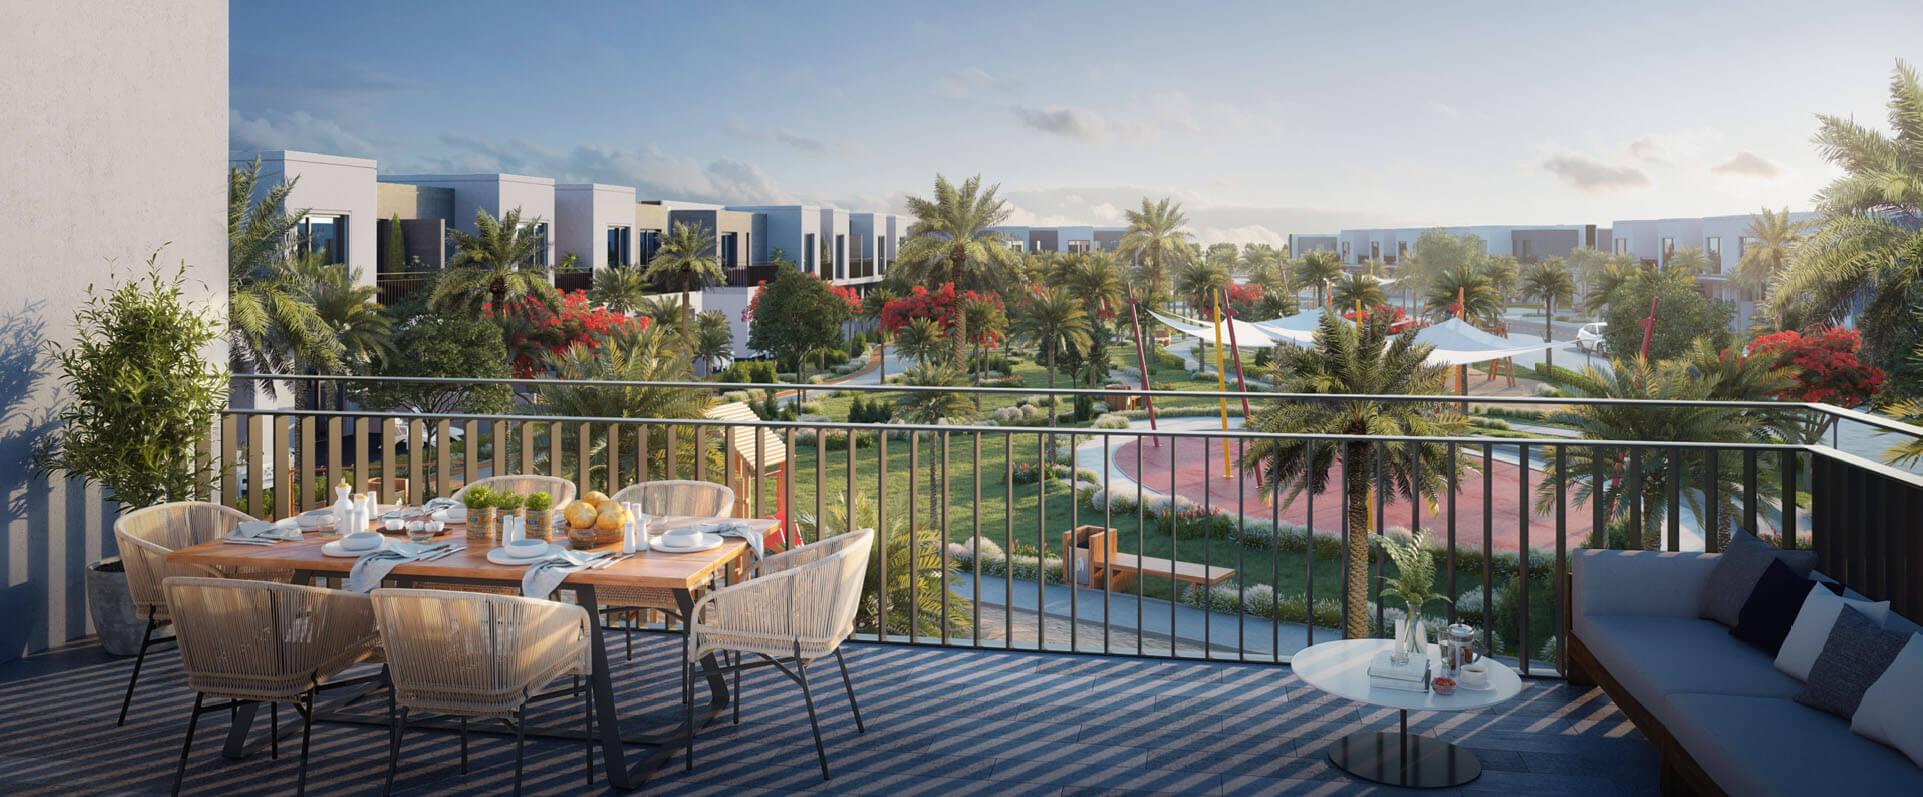 Real Esate, Properties for Sale, Buy or Rent in Dubai